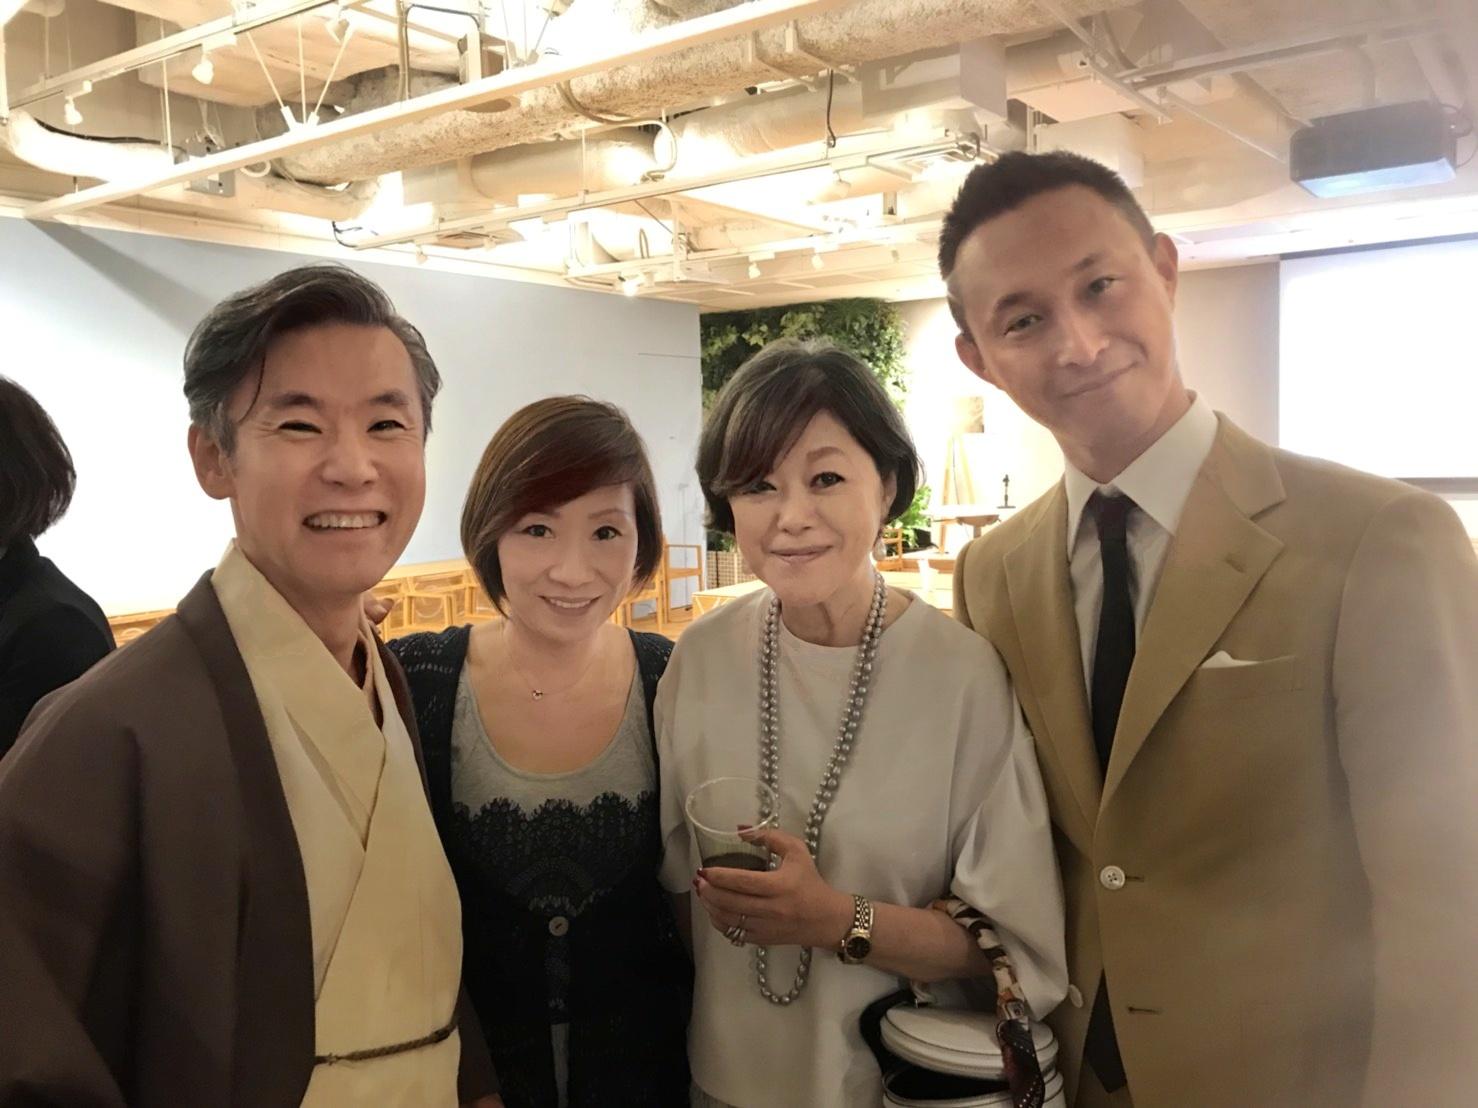 TANGO OPEN  TANGO KYOTO JAPAN ロゴ発表会♪_d0339889_11392840.jpg